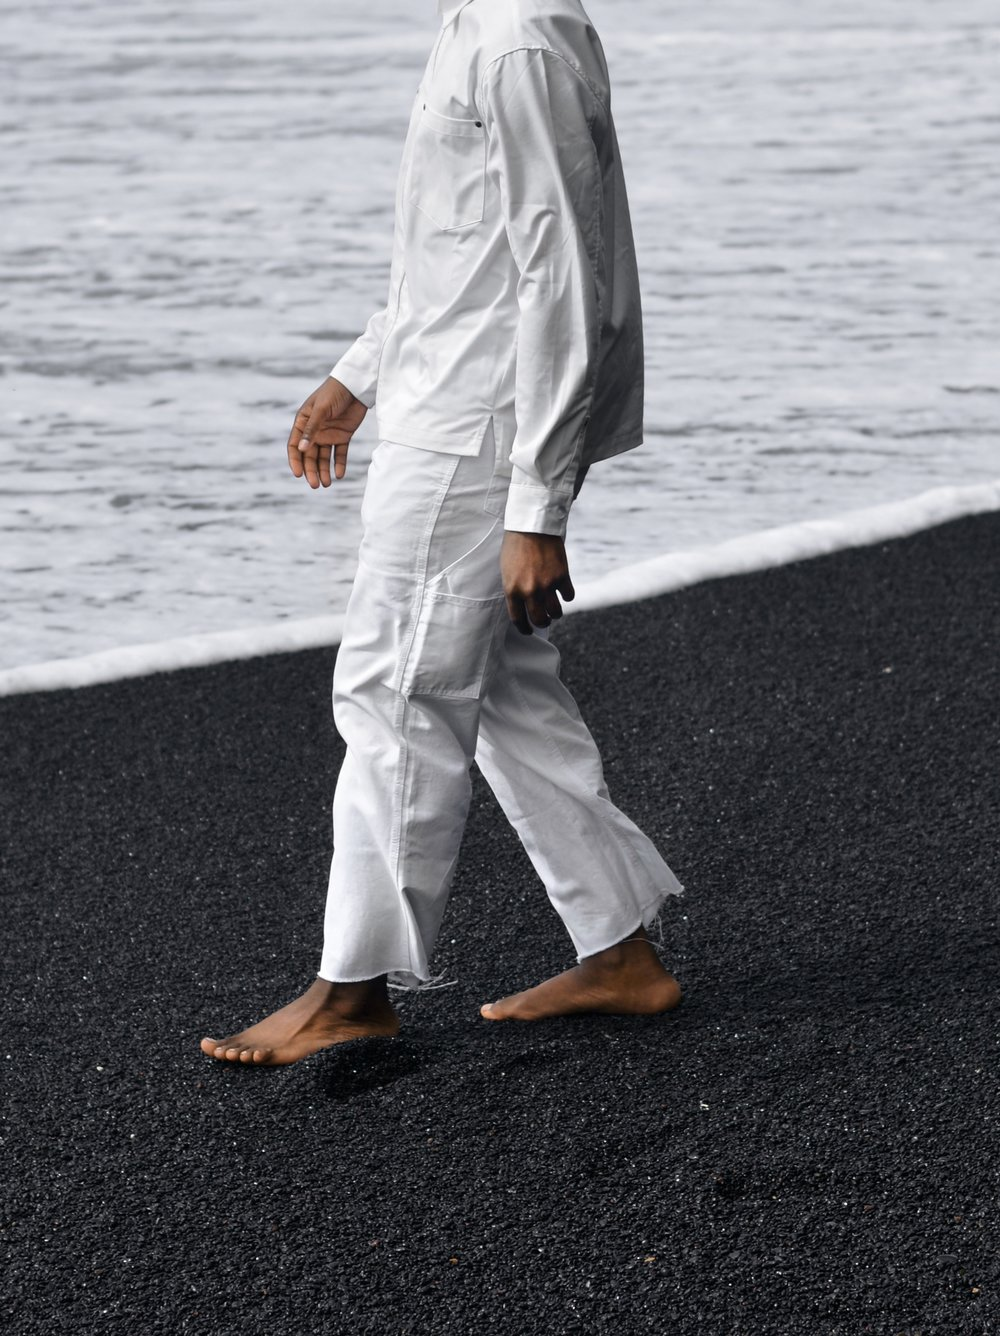 The-Look-Principle-Editorial-Reynisfjara-Beach-2.jpg